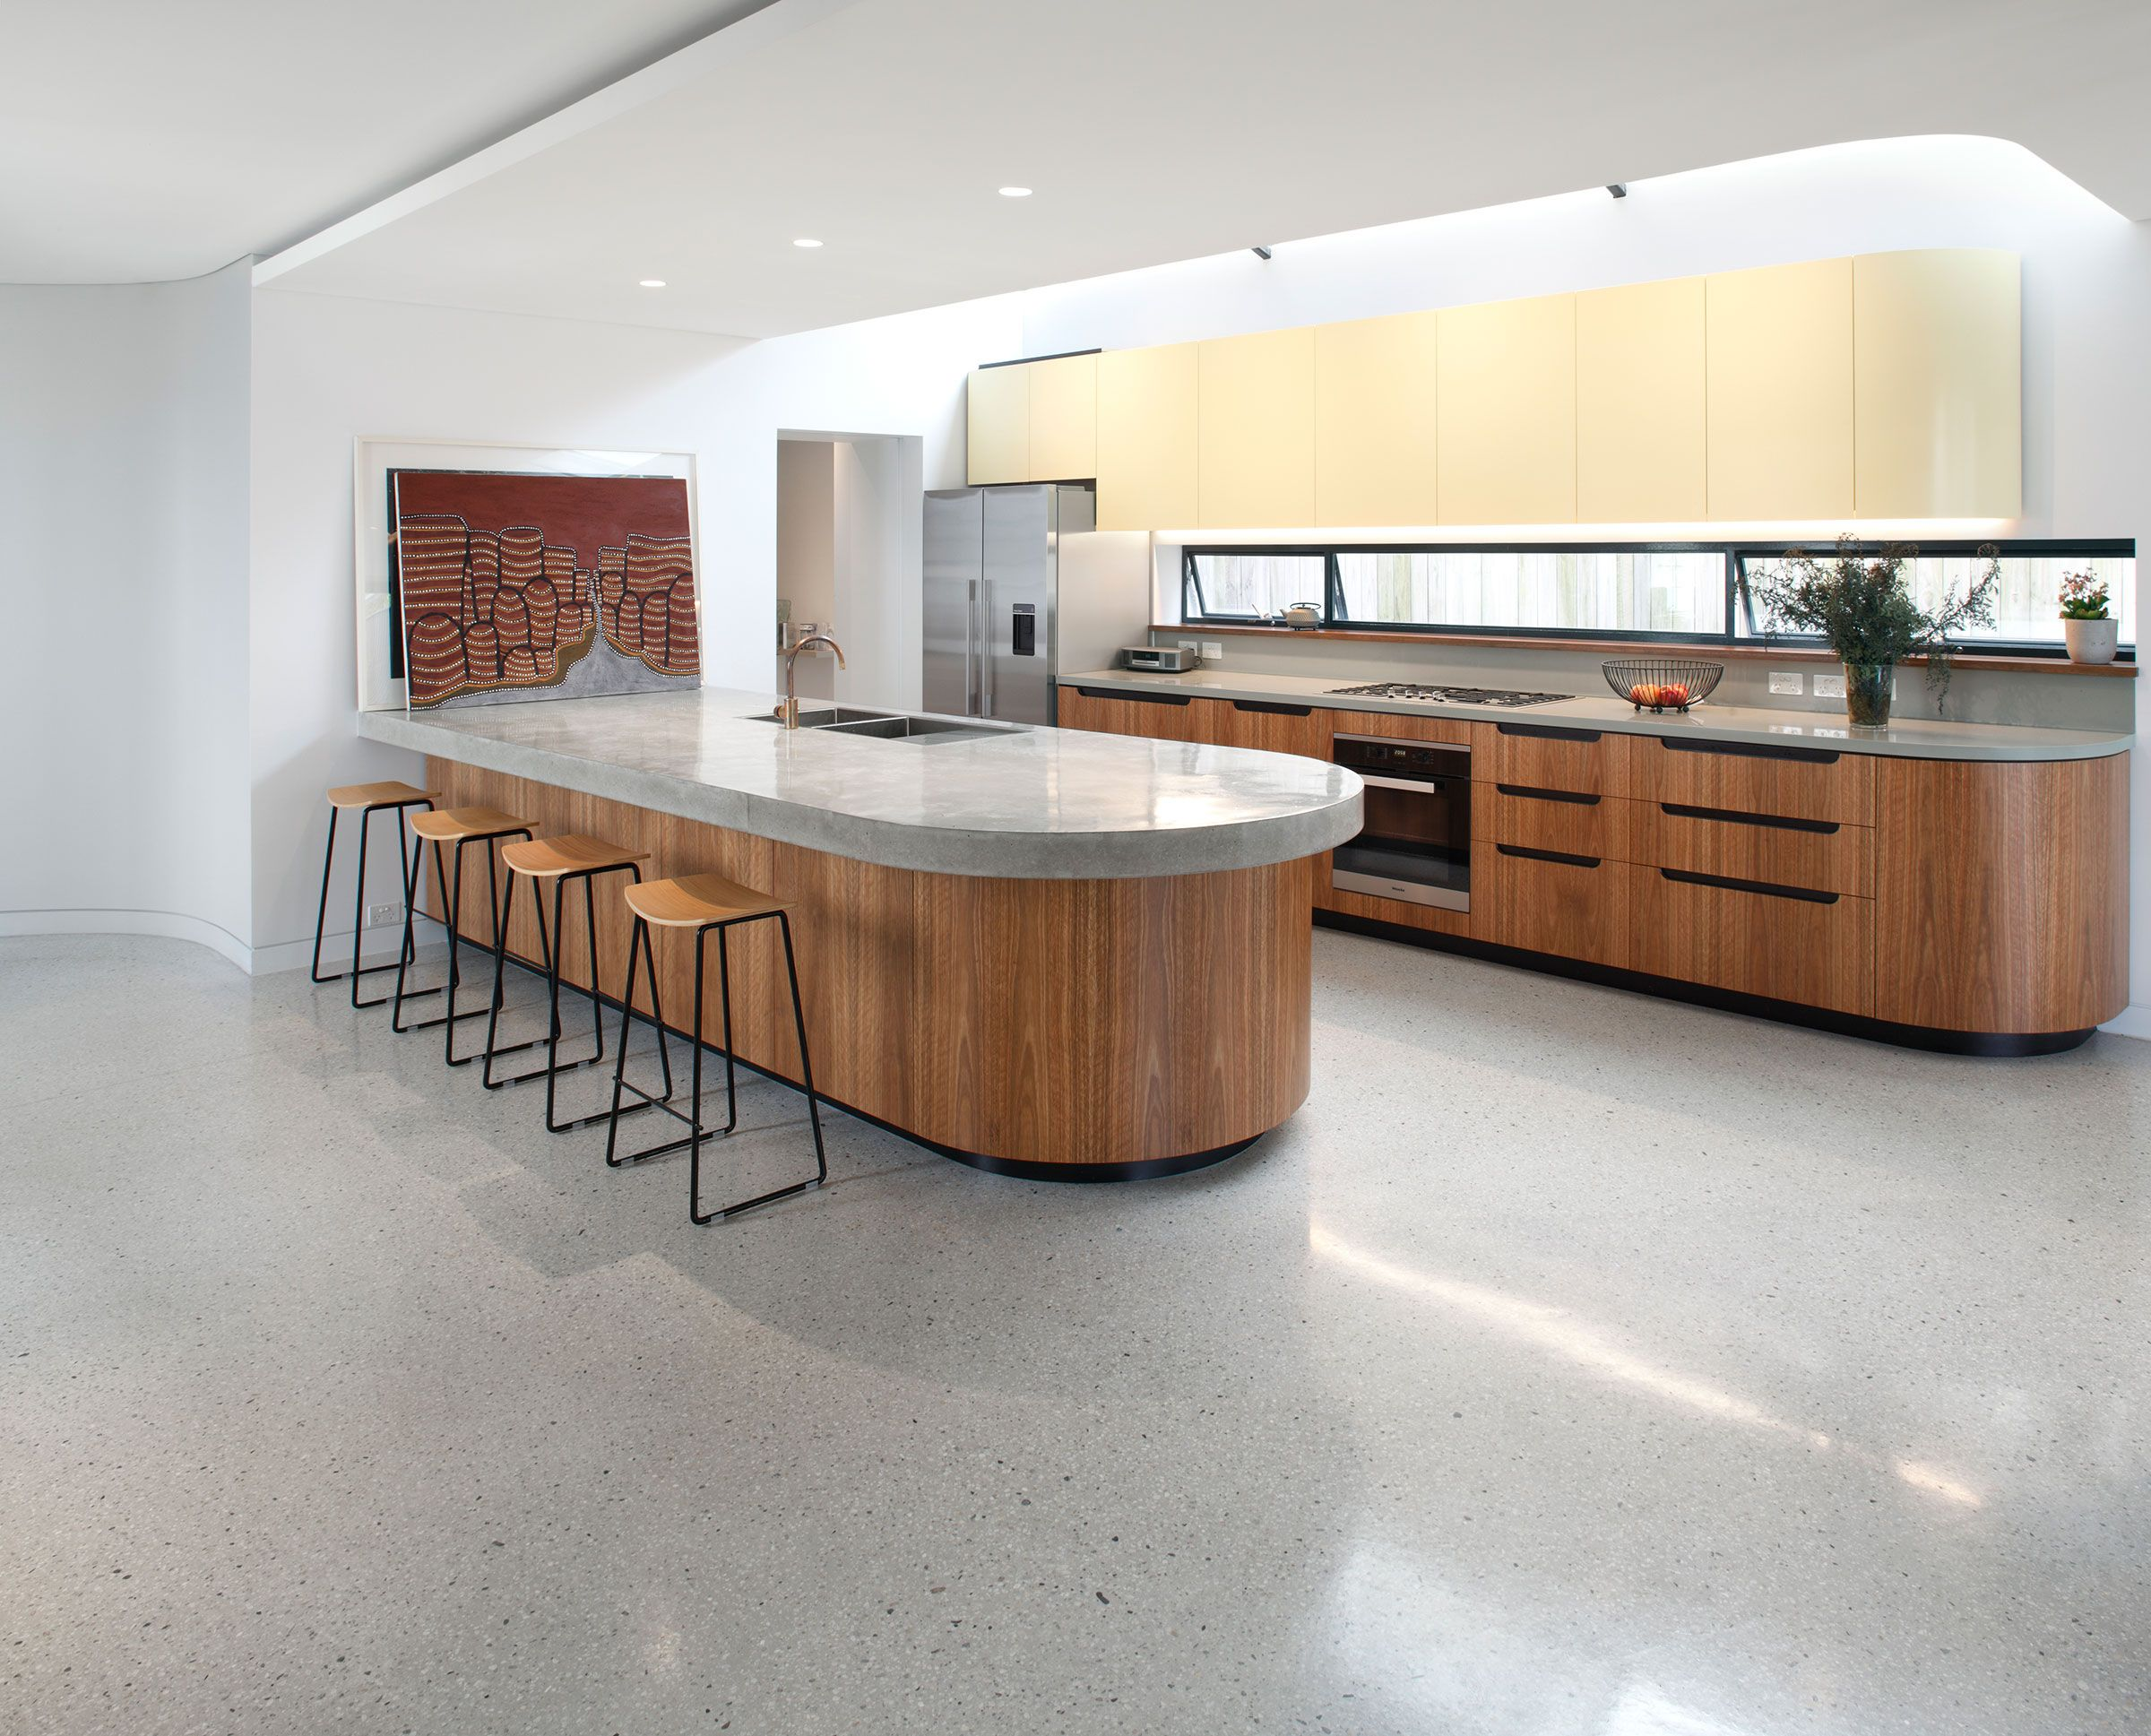 polished concrete flooring concrete floors for kitchen